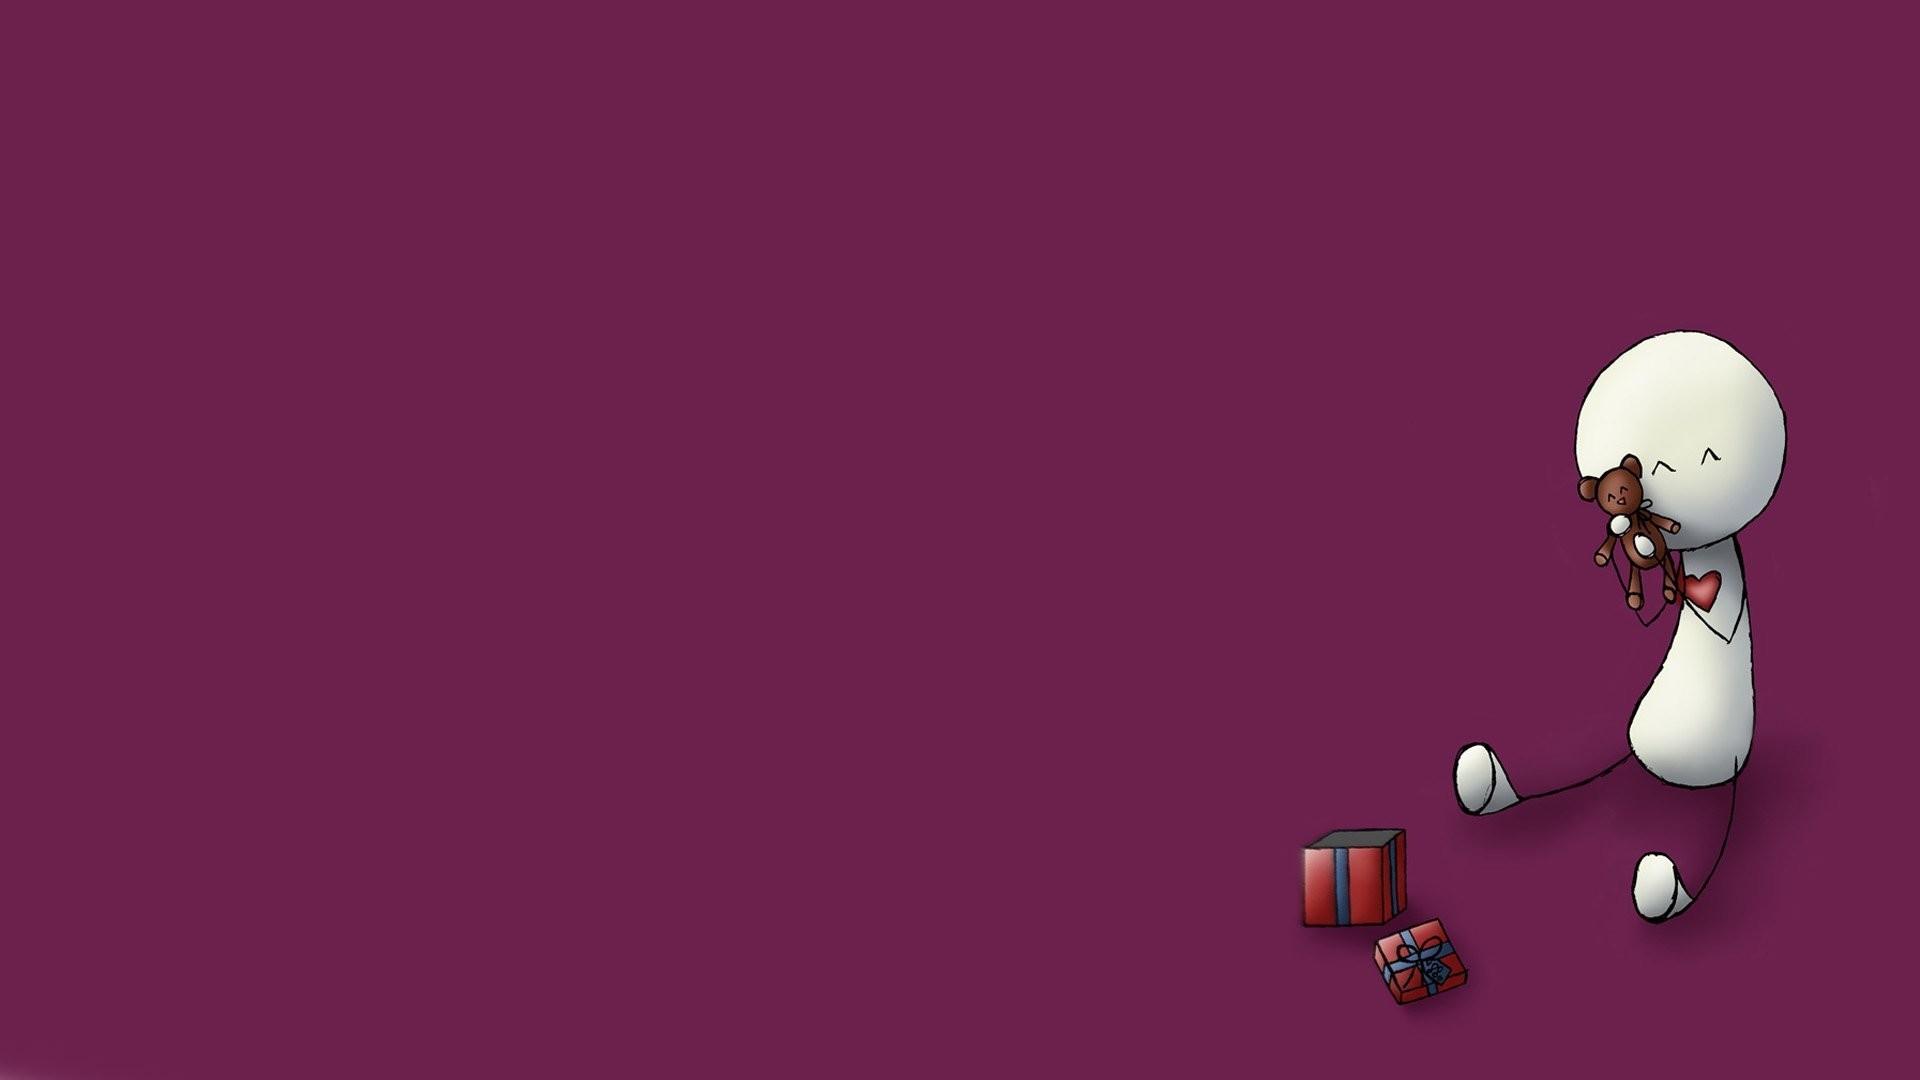 66 Funny Desktop Wallpapers on WallpaperPlay 1920x1080